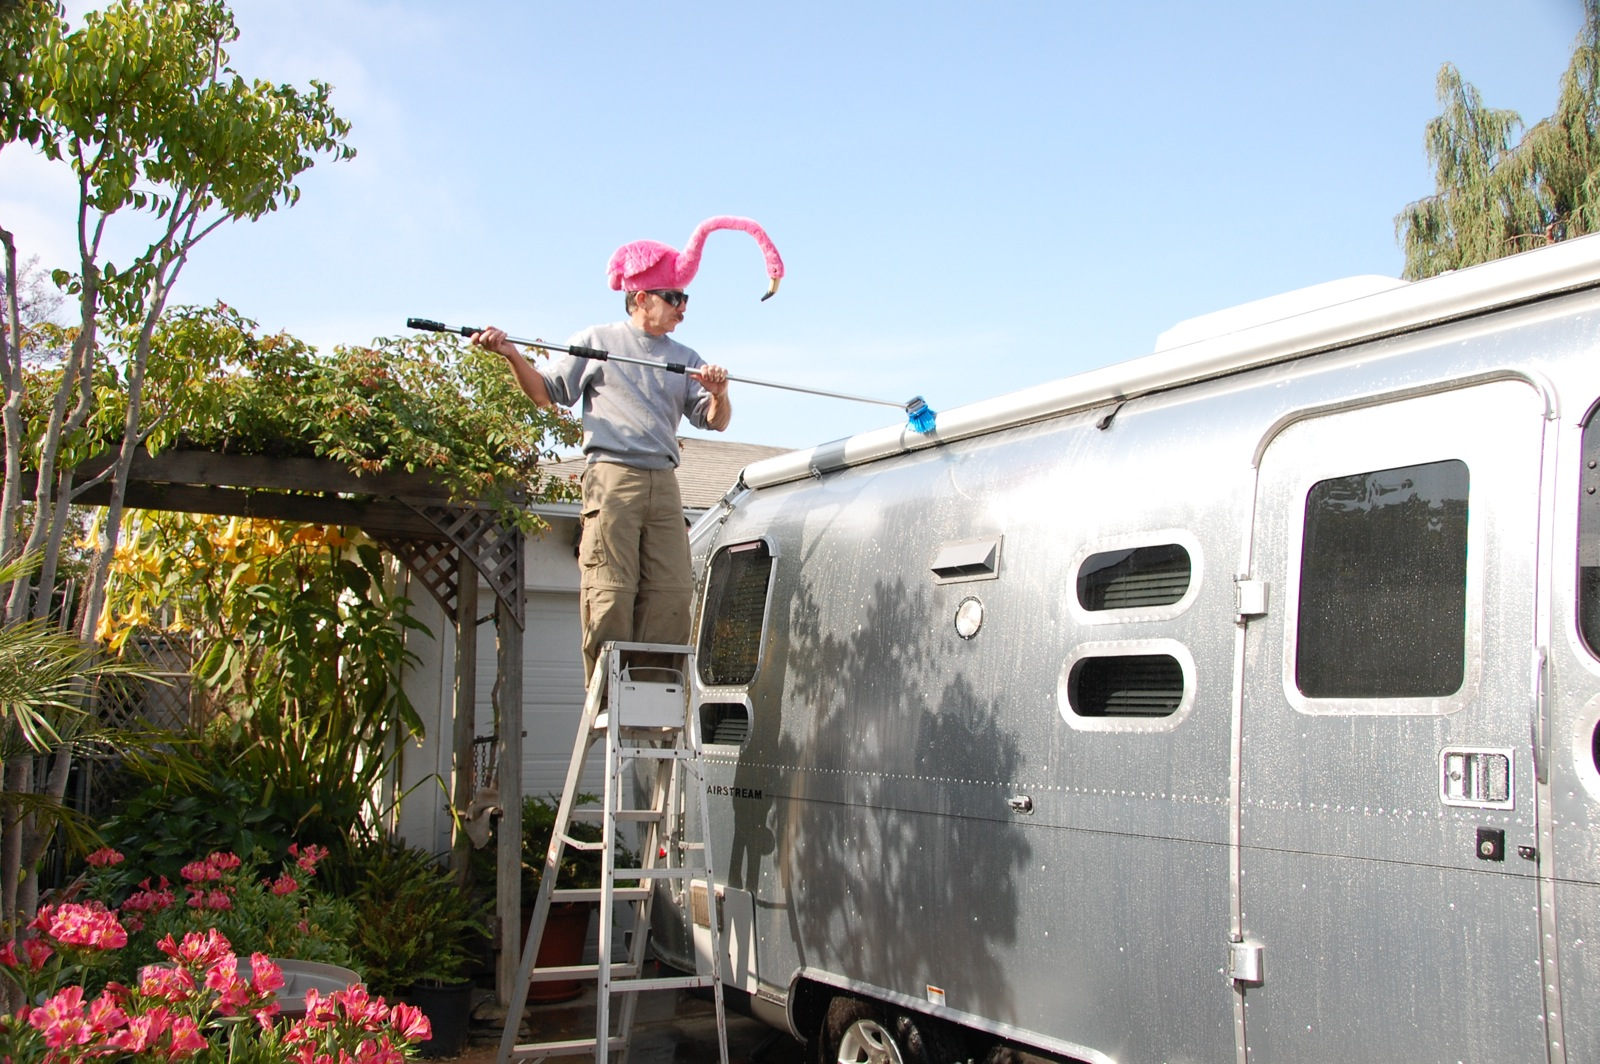 Click image for larger version  Name:DSC_0070 Washing brush & flamingo.jpg Views:115 Size:536.5 KB ID:110825